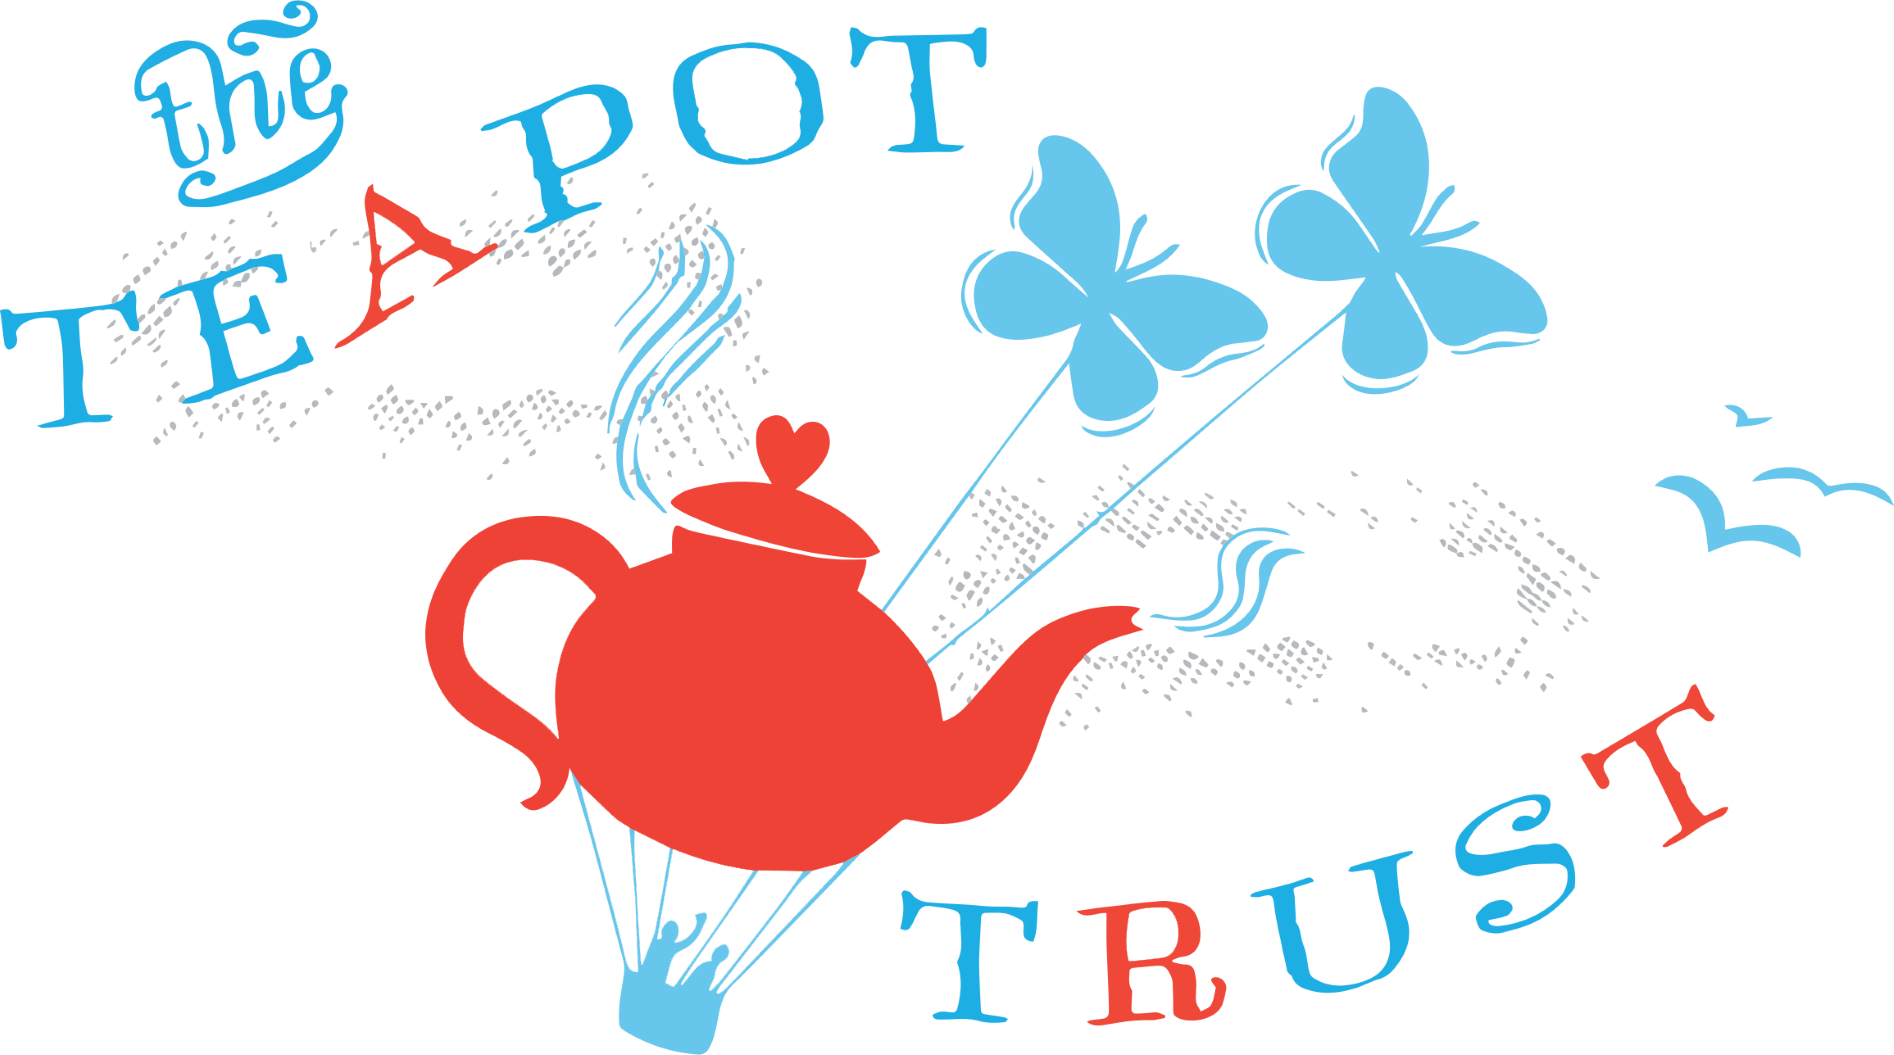 The Teapot Trust